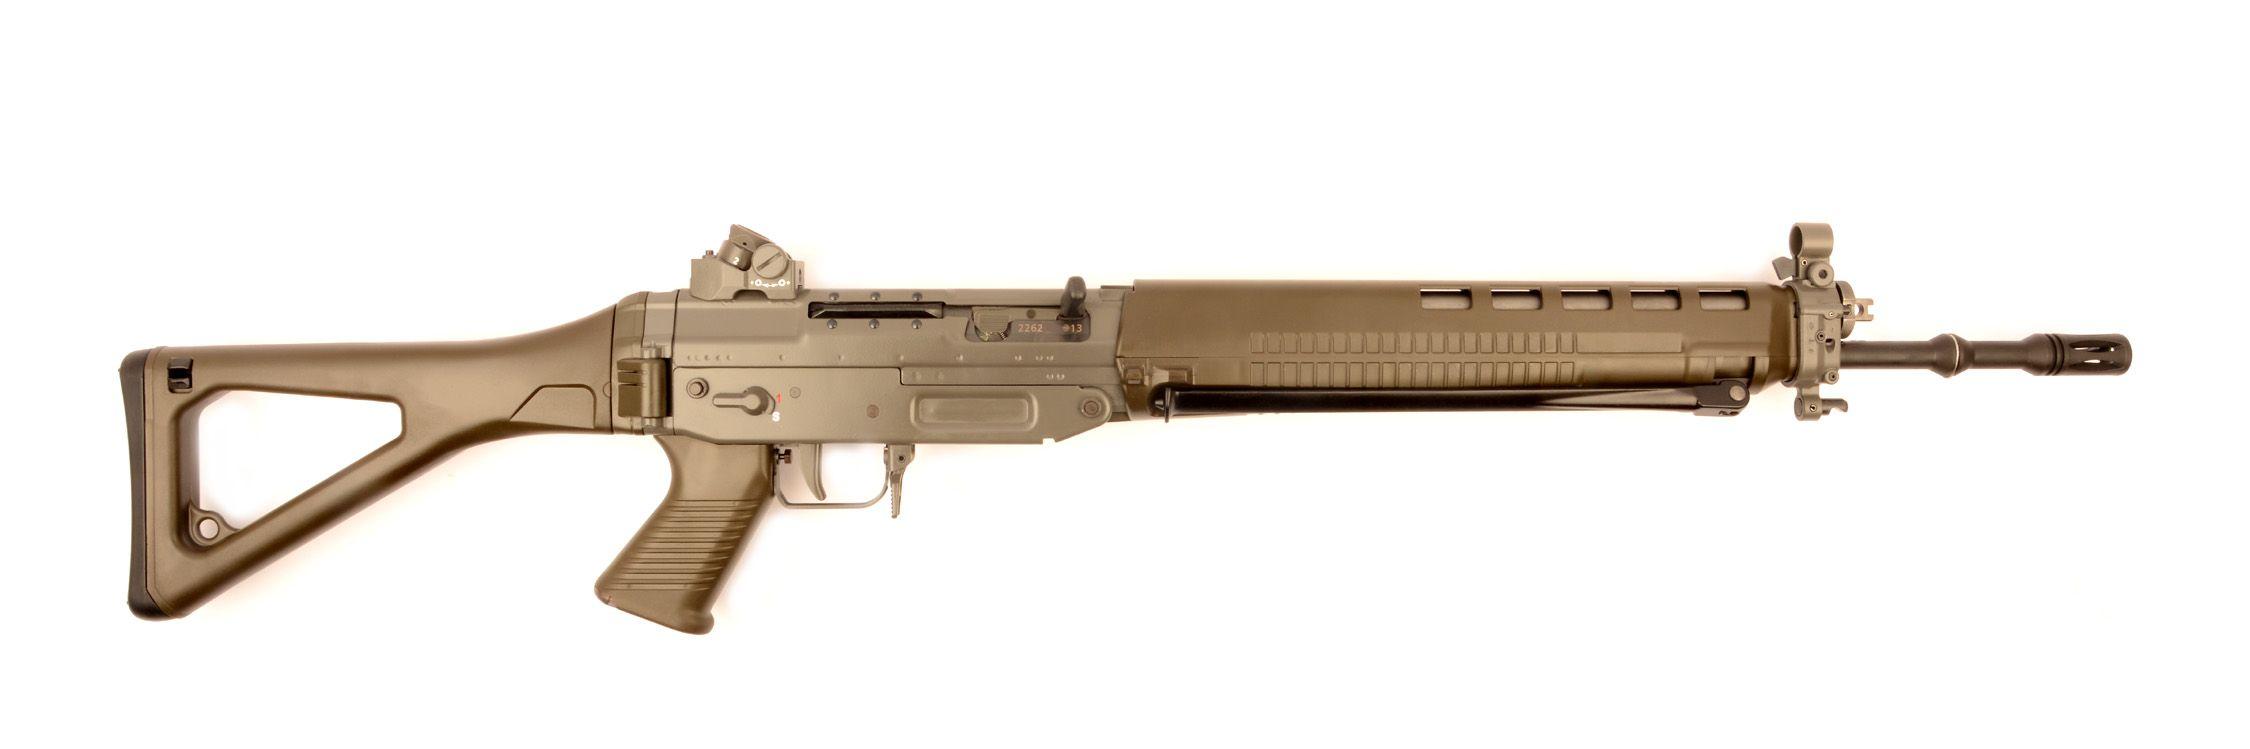 remington 550 1 manual pdf